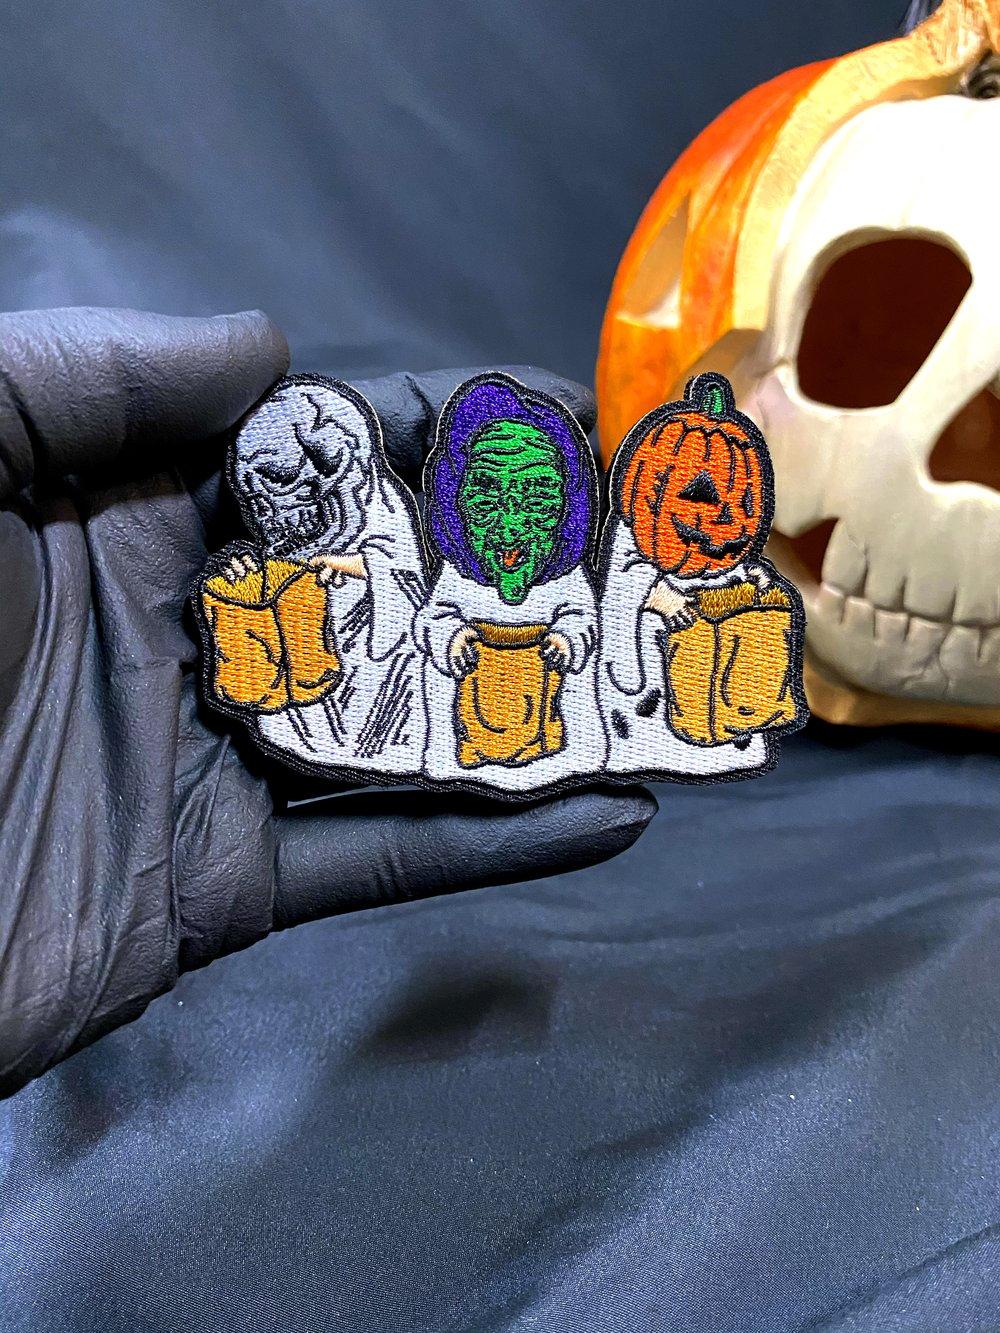 Season Of The Great Pumpkin (Patch)